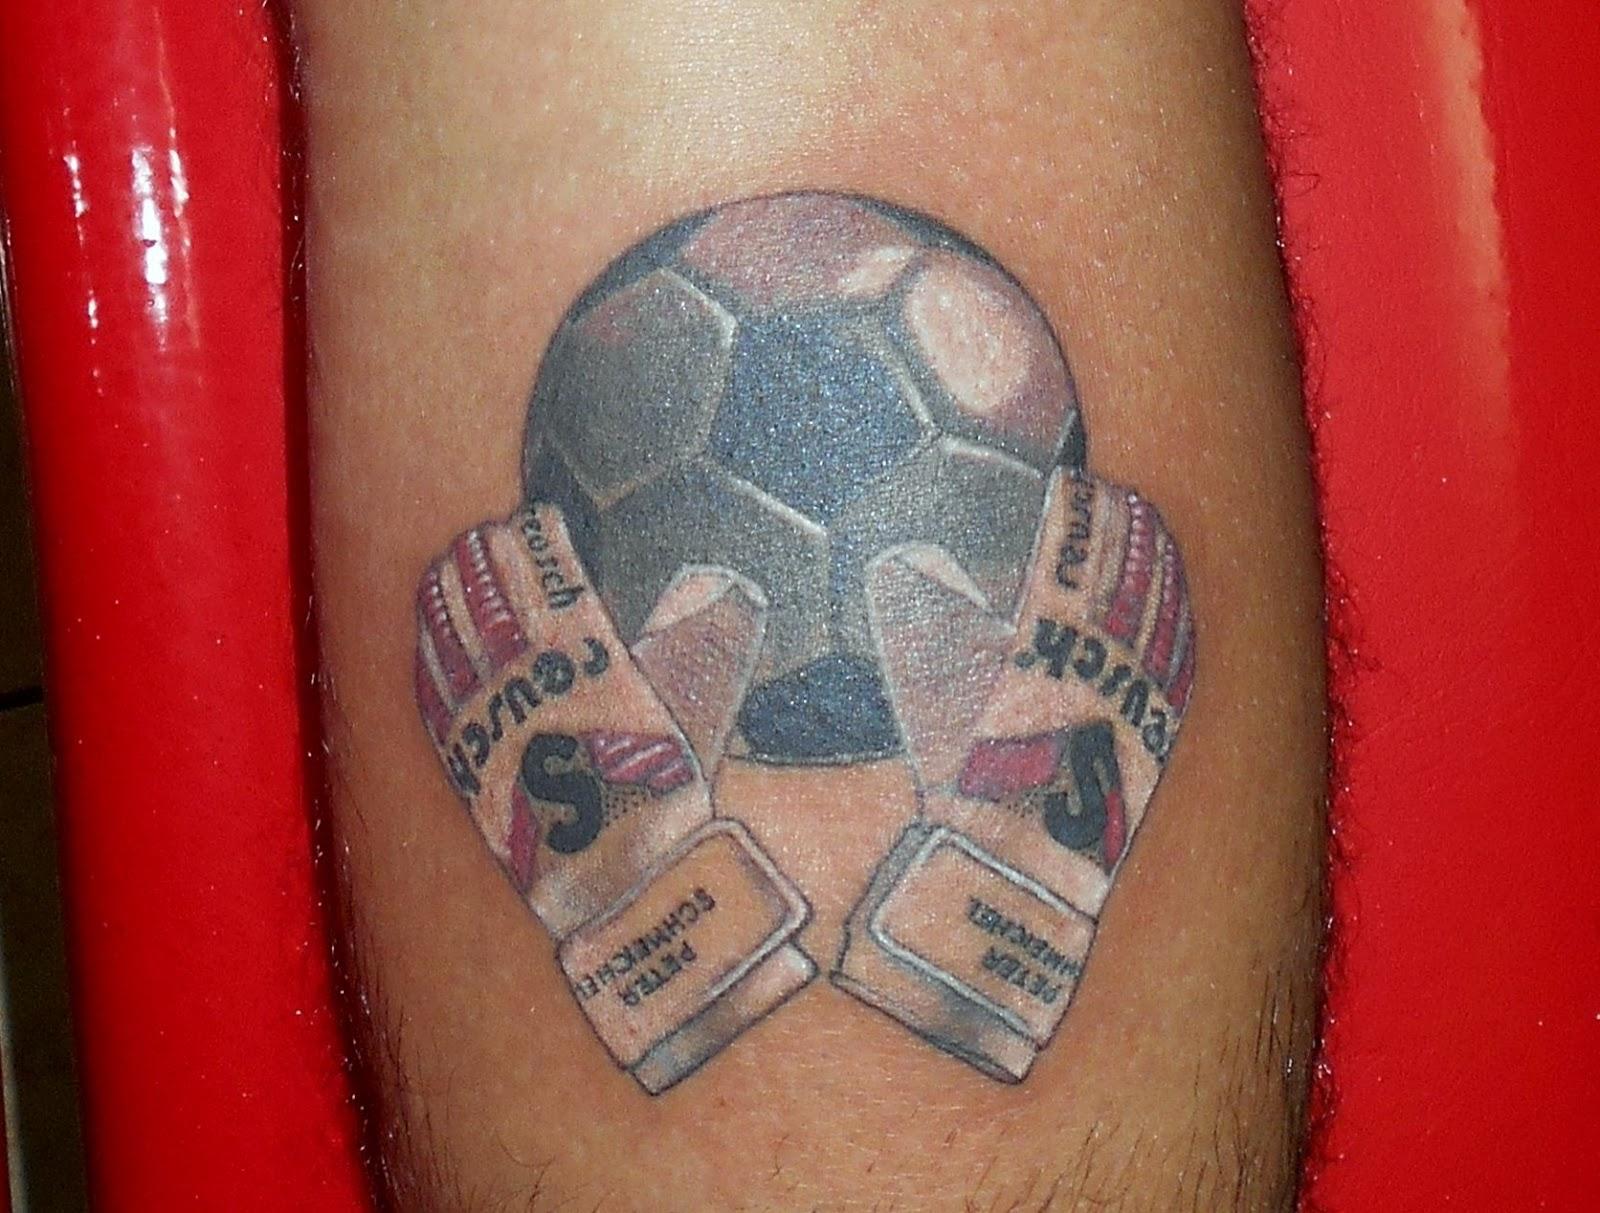 Tatuajes Lfa Tatuaje Guantes Y Pelota De Futbol